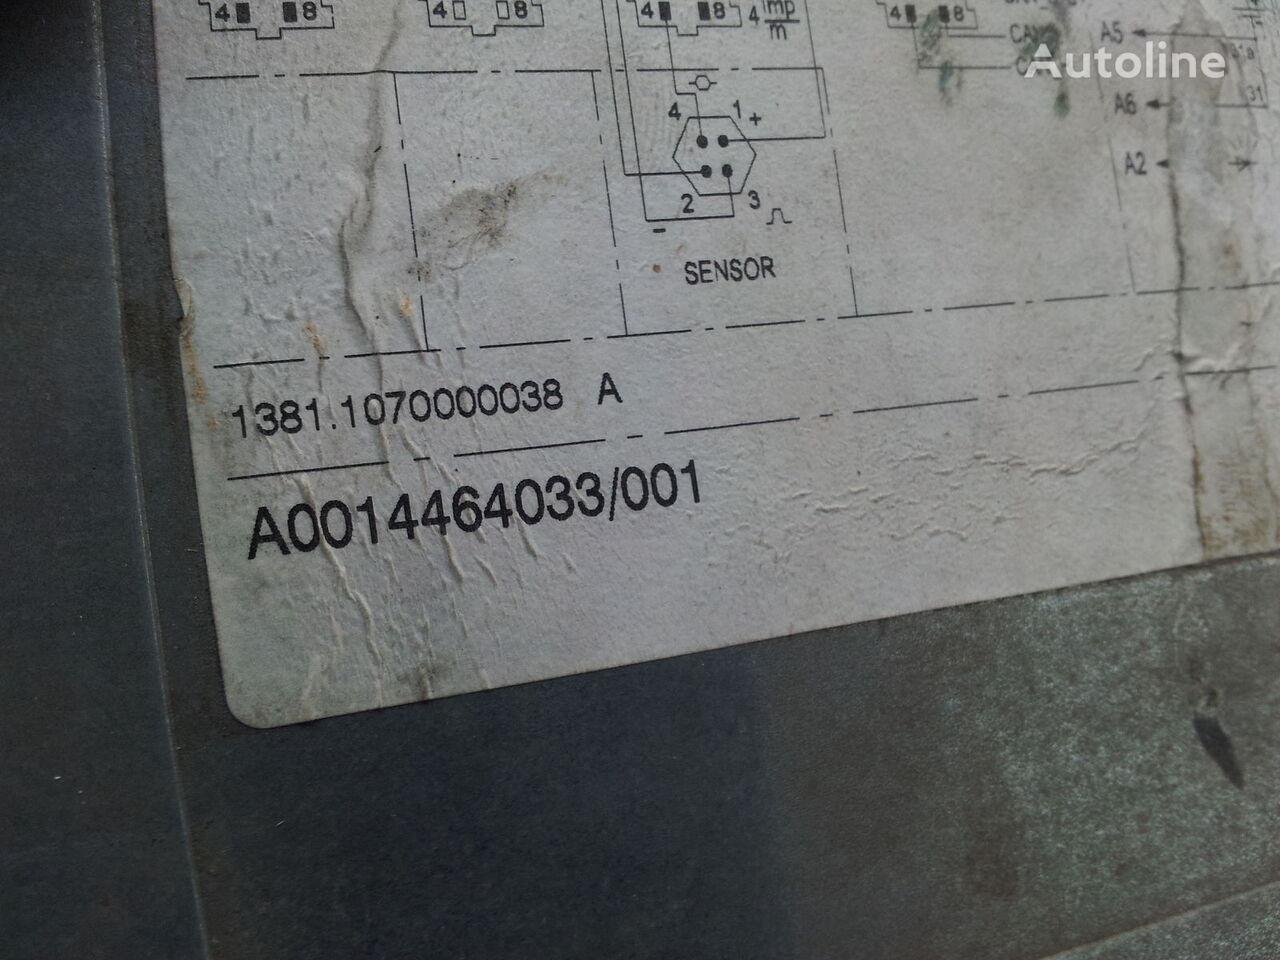 lucas kienzle tachograph wiring diagram dsl home run vdo 1318 best library mercedes benz type 1381 24v digital dtco 0024461833 rh autoline info pages